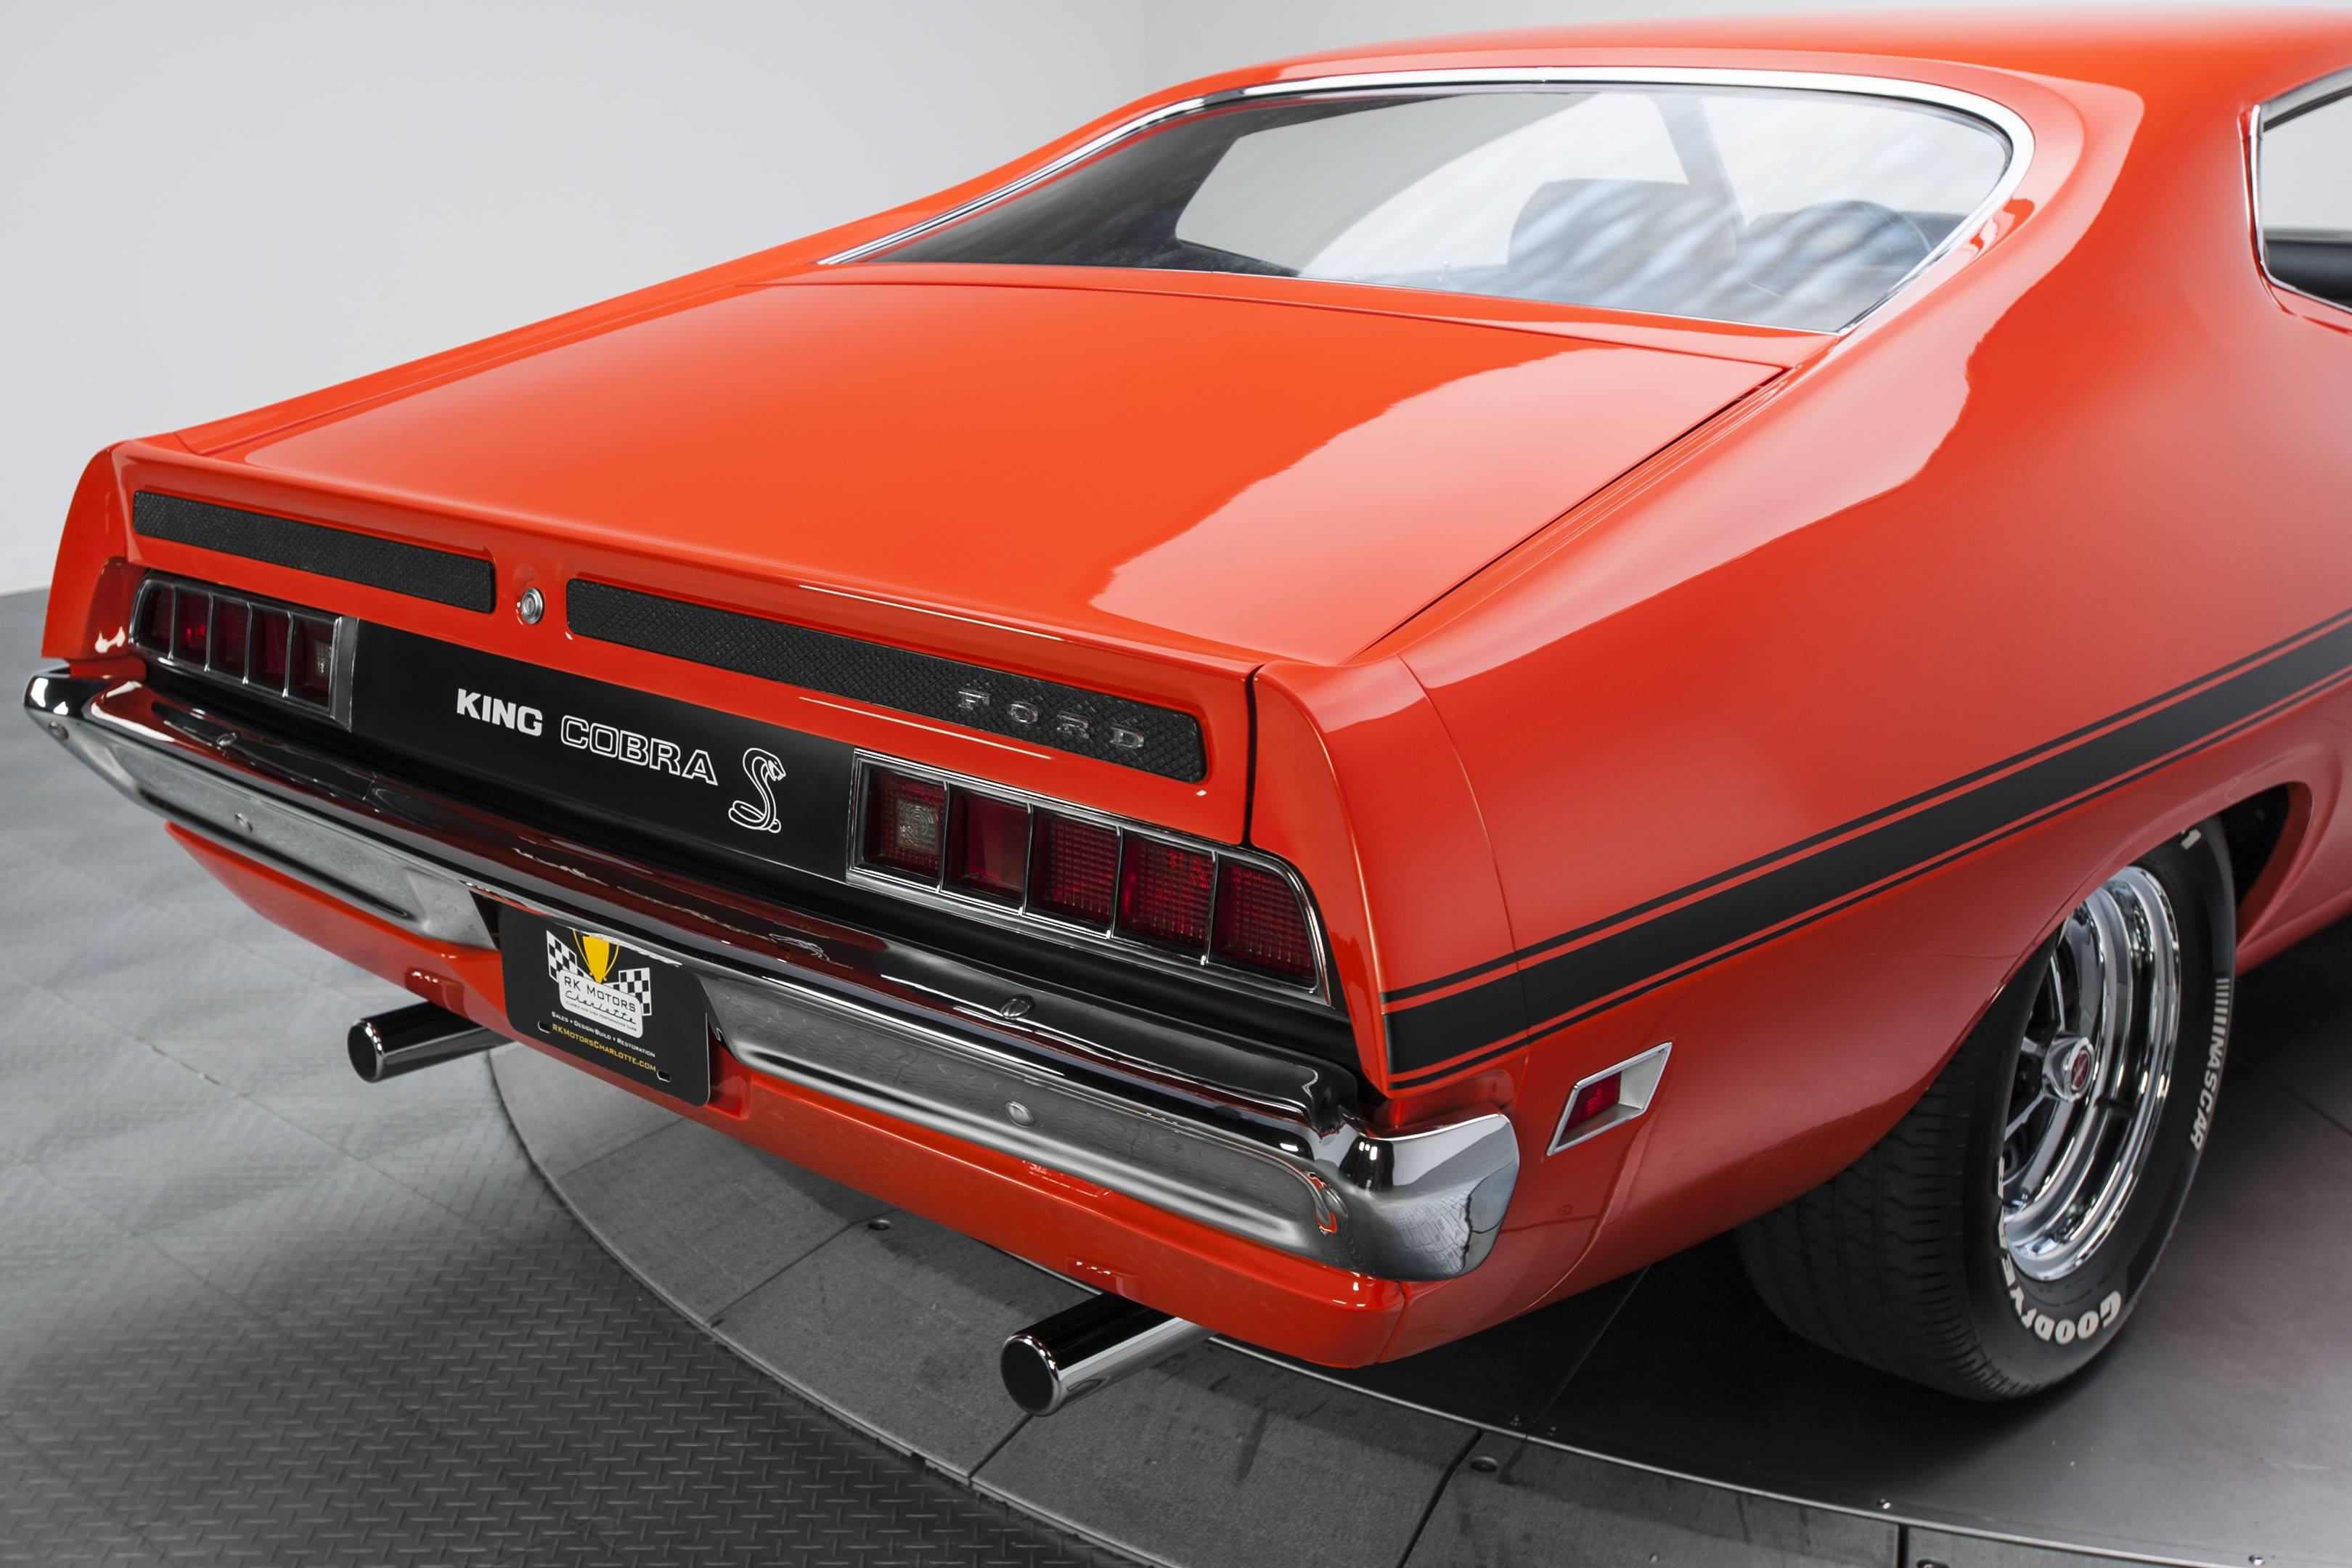 Ford Torino King Cobra tail